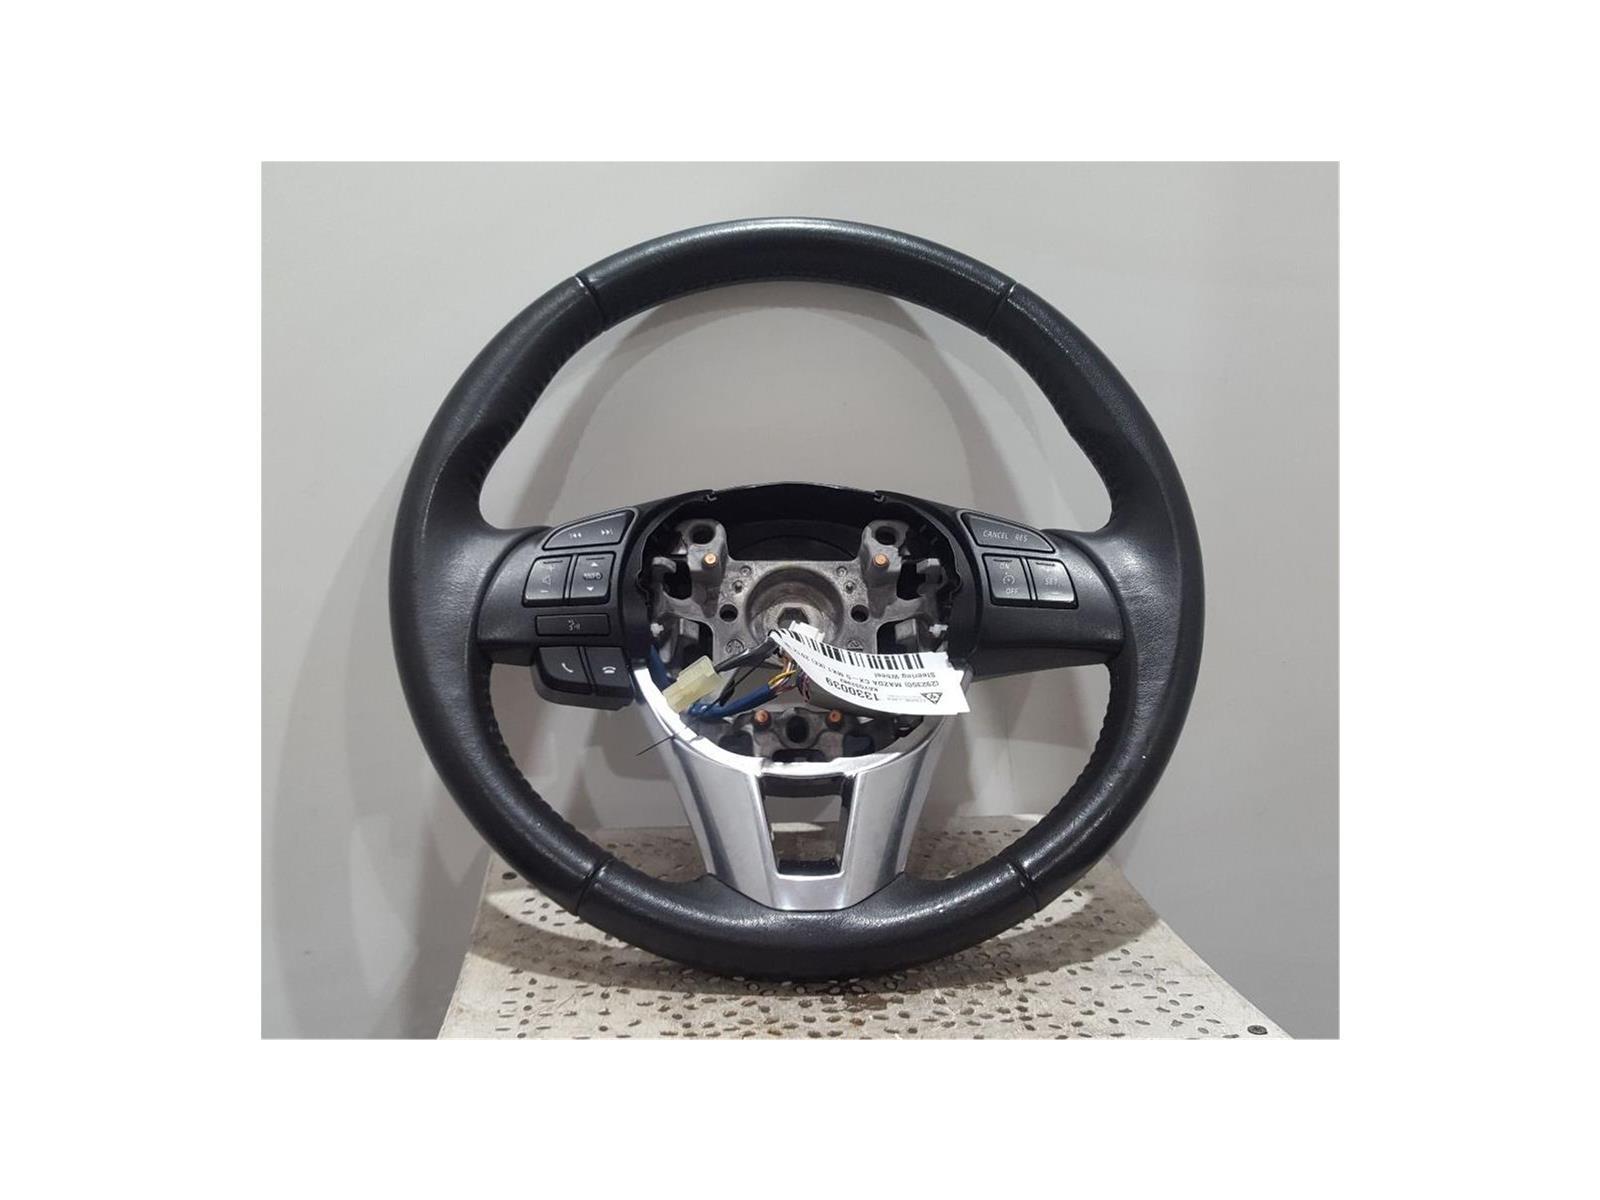 MAZDA CX-5 - MK1 (KE) 2012 TO 2016 - Steering Wheel KAYG32982